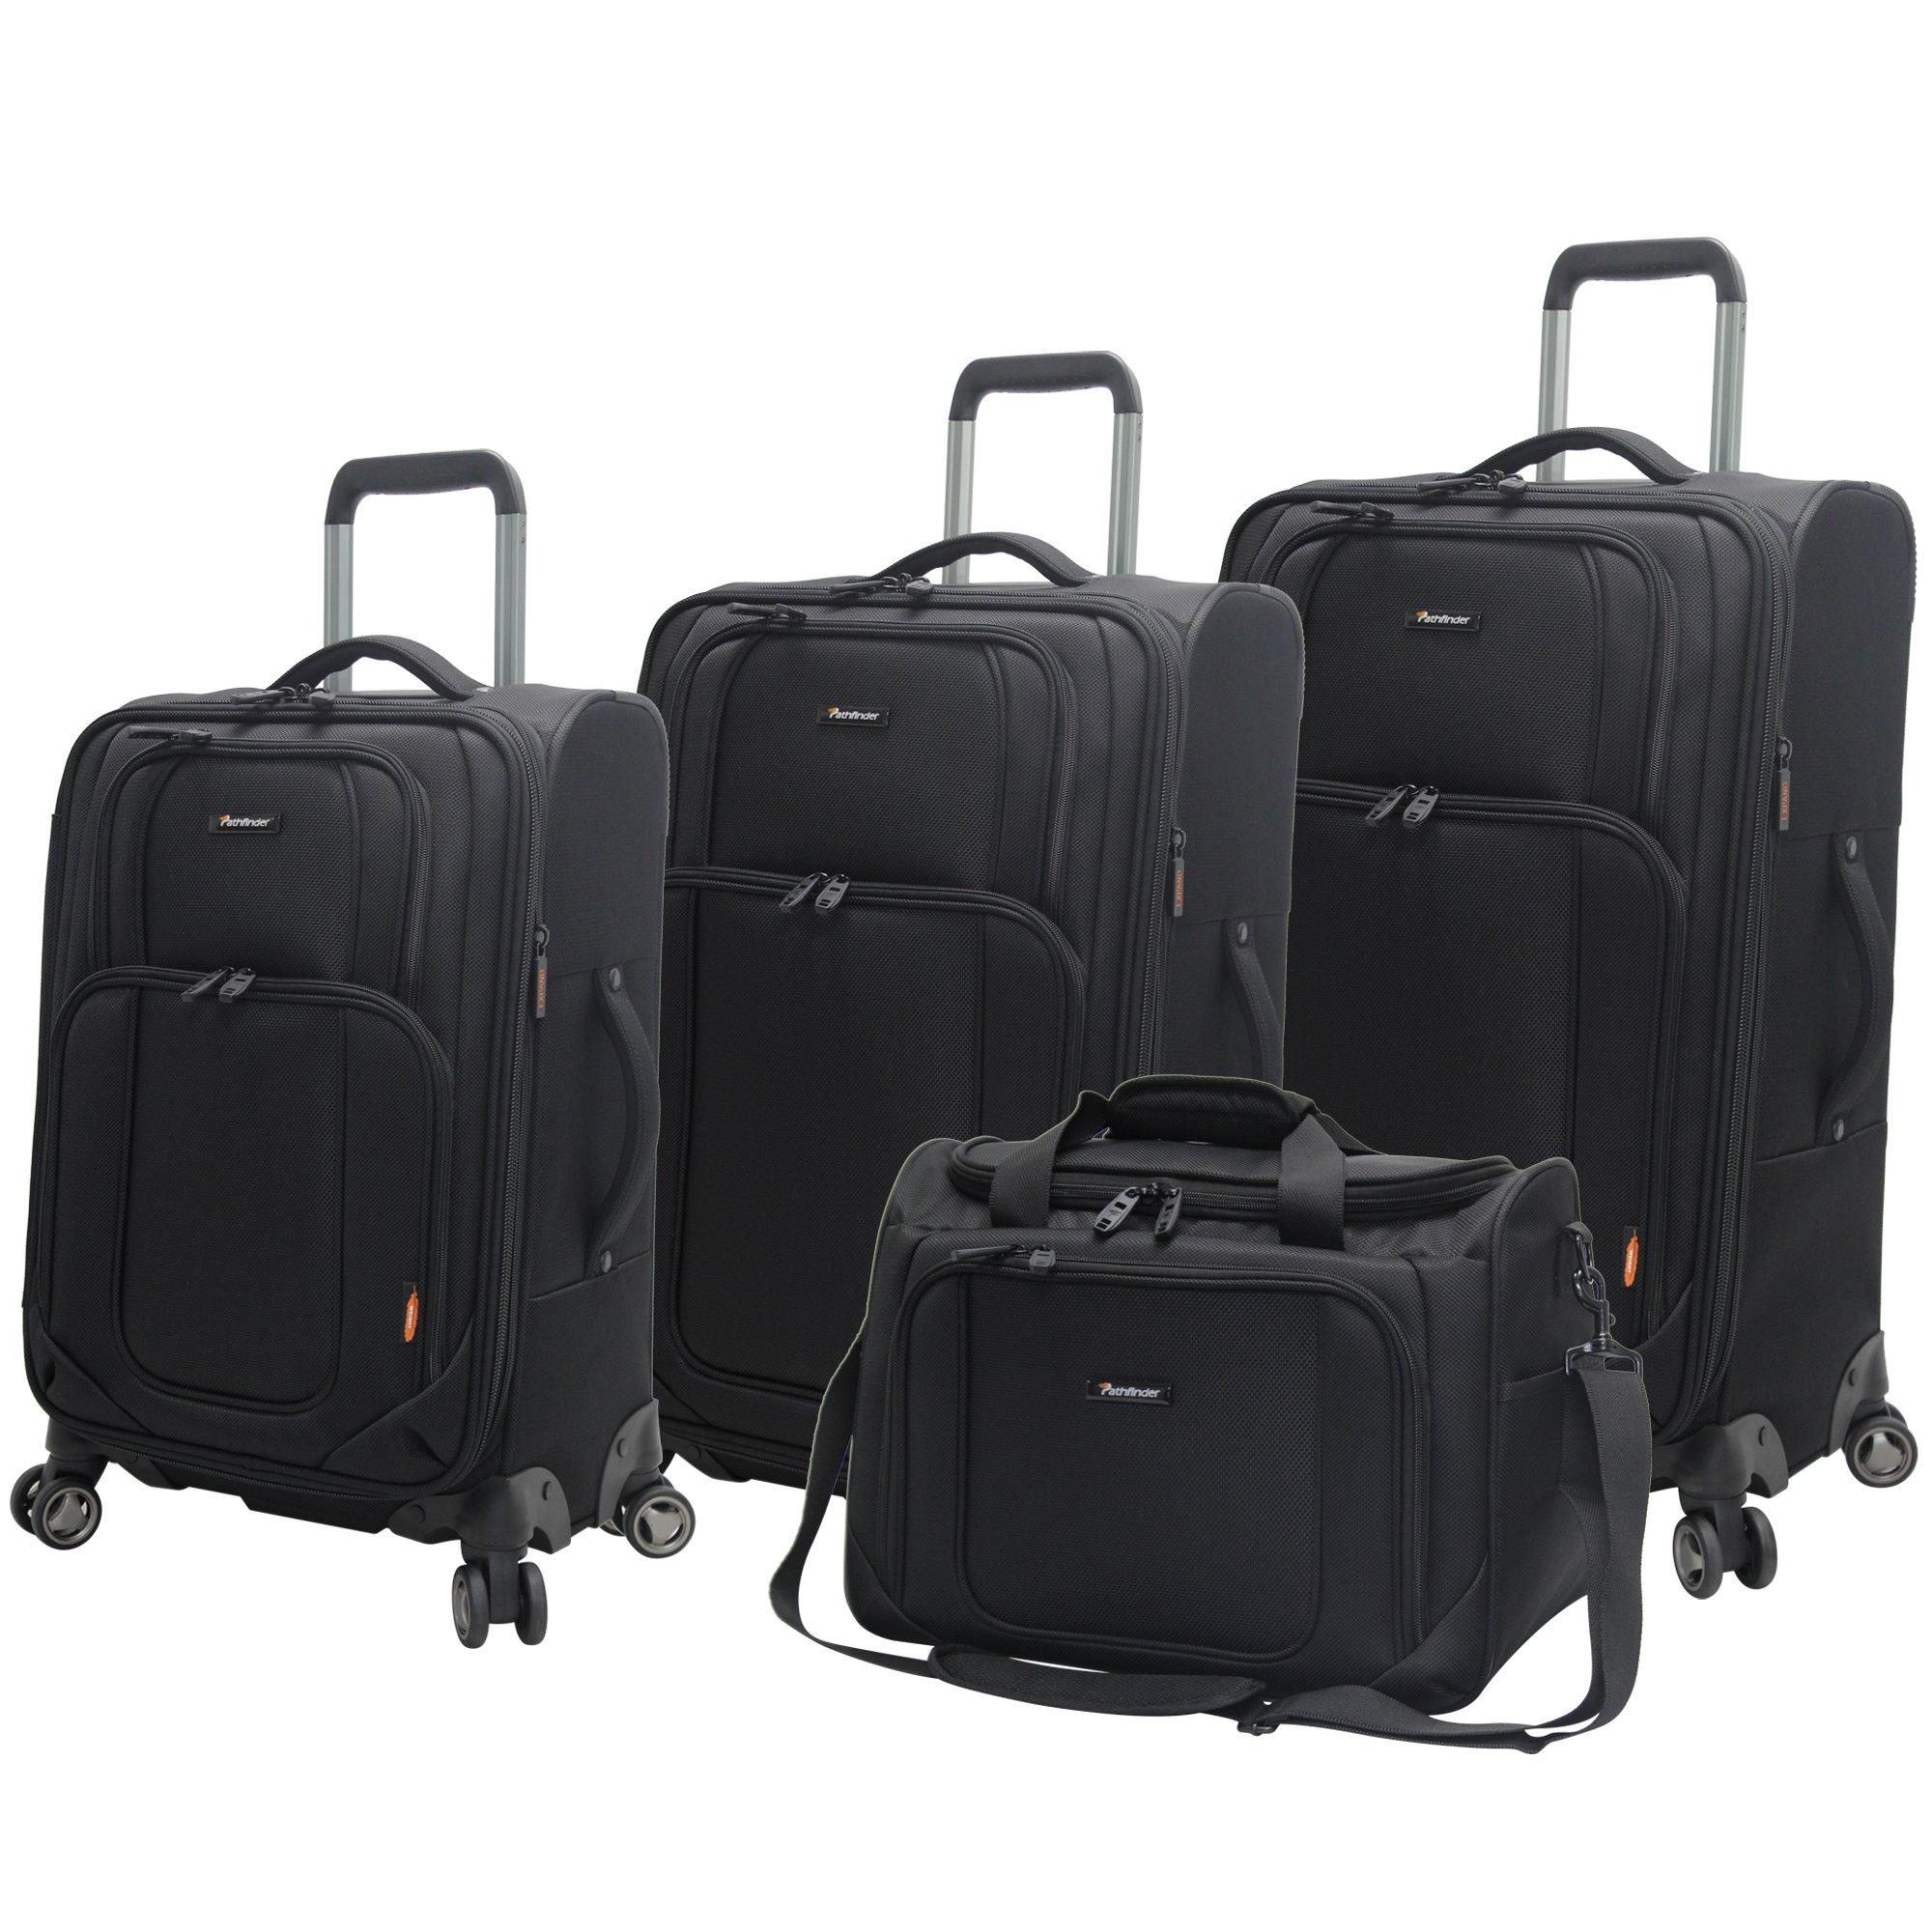 Pathfinder Luggage Presidential 4 piece Spinner Suitcase Set (Black) by Pathfinder